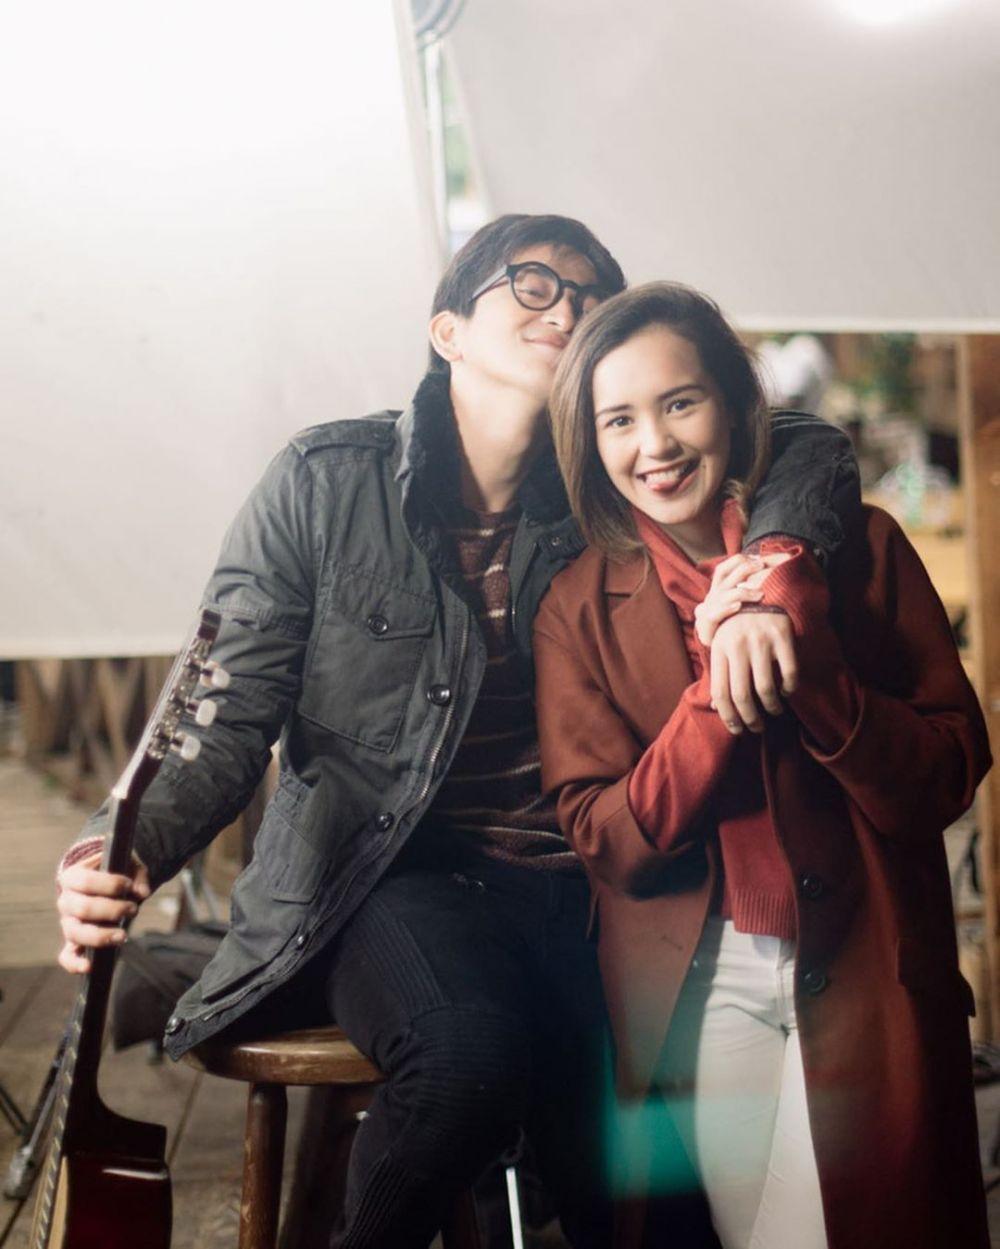 Bikin Geger! Kisah Cinta 9 Bintang Film yang Paling Disorot Tahun Ini